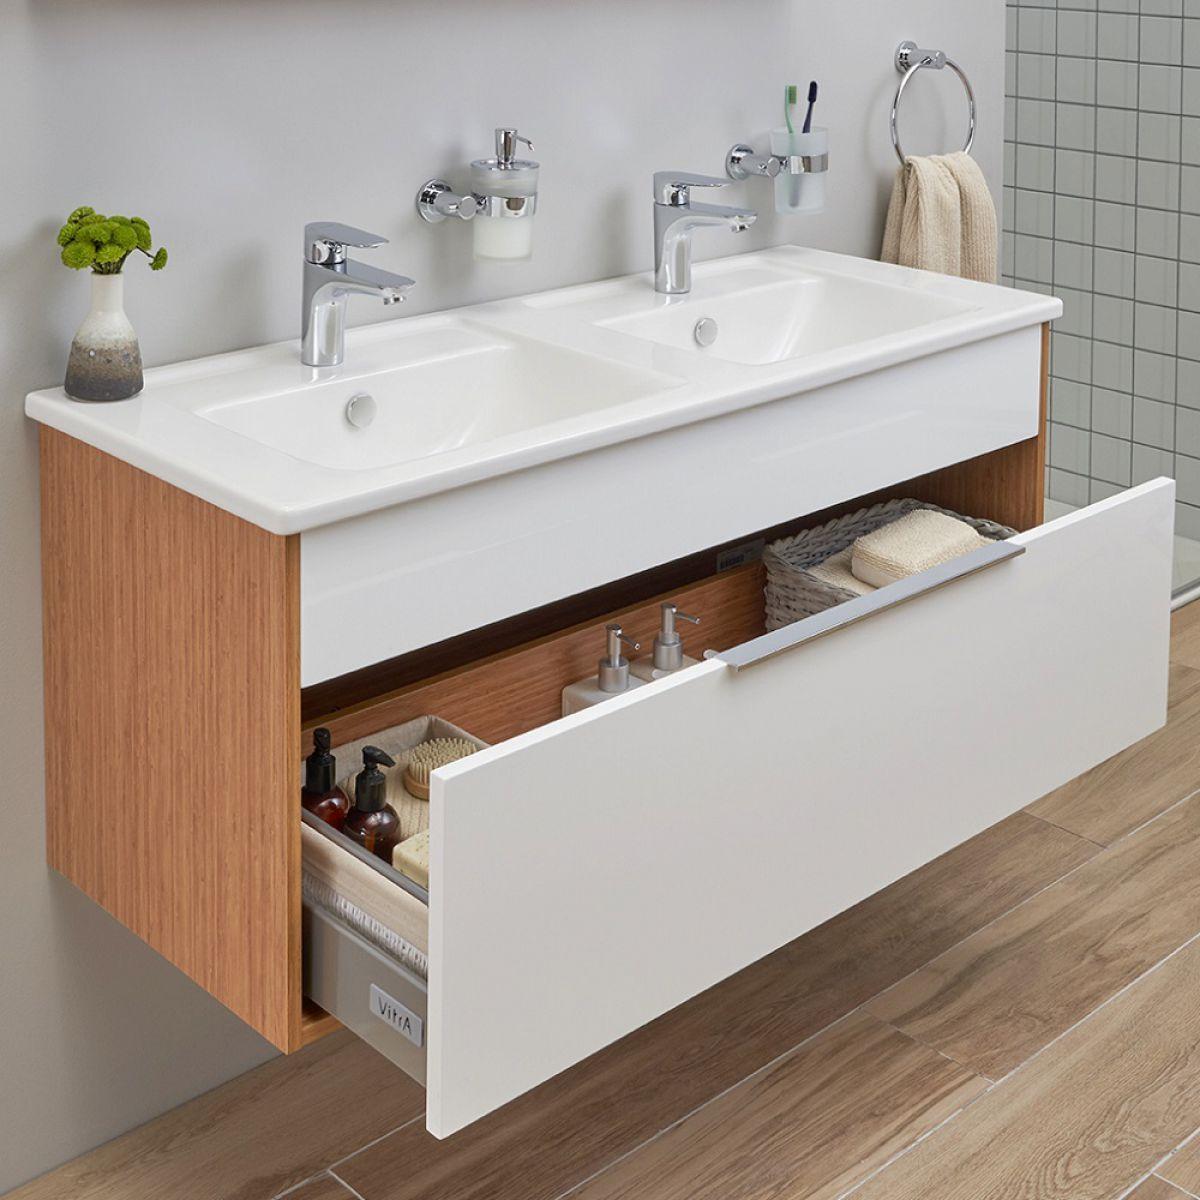 Vitra Integra Extra Large Double 120cm Vanity Unit With Basin